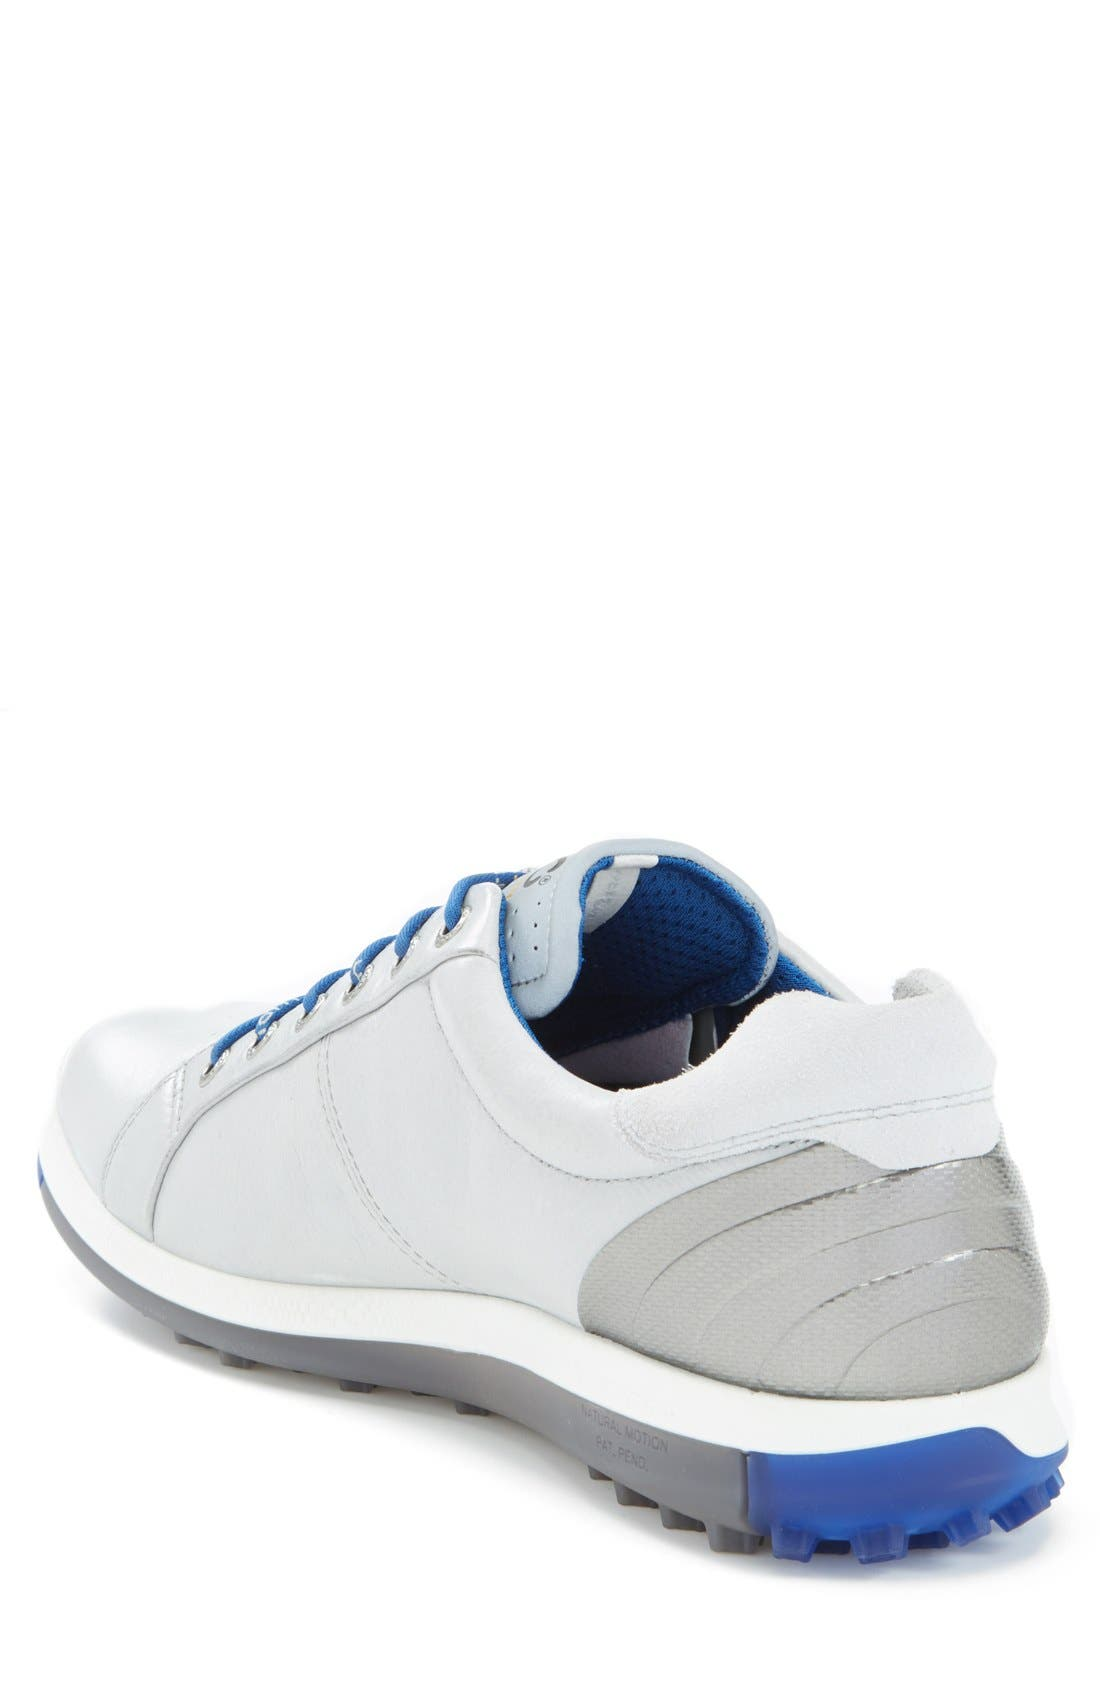 BIOM Hybrid 2 Golf Shoe,                             Alternate thumbnail 2, color,                             Concrete/ Royal